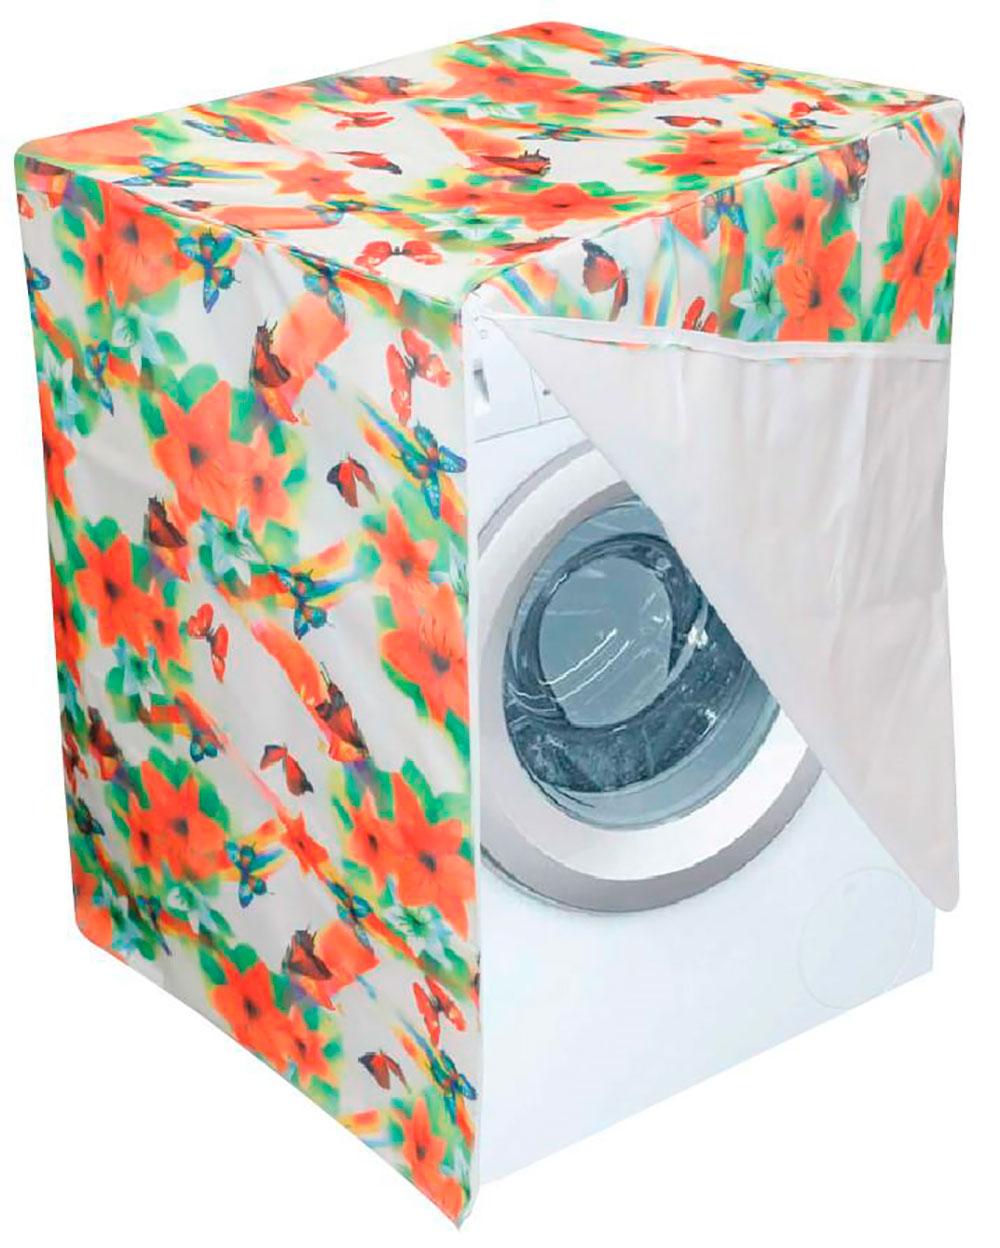 protector para lavadora o secadora estampada puerta circular estandar